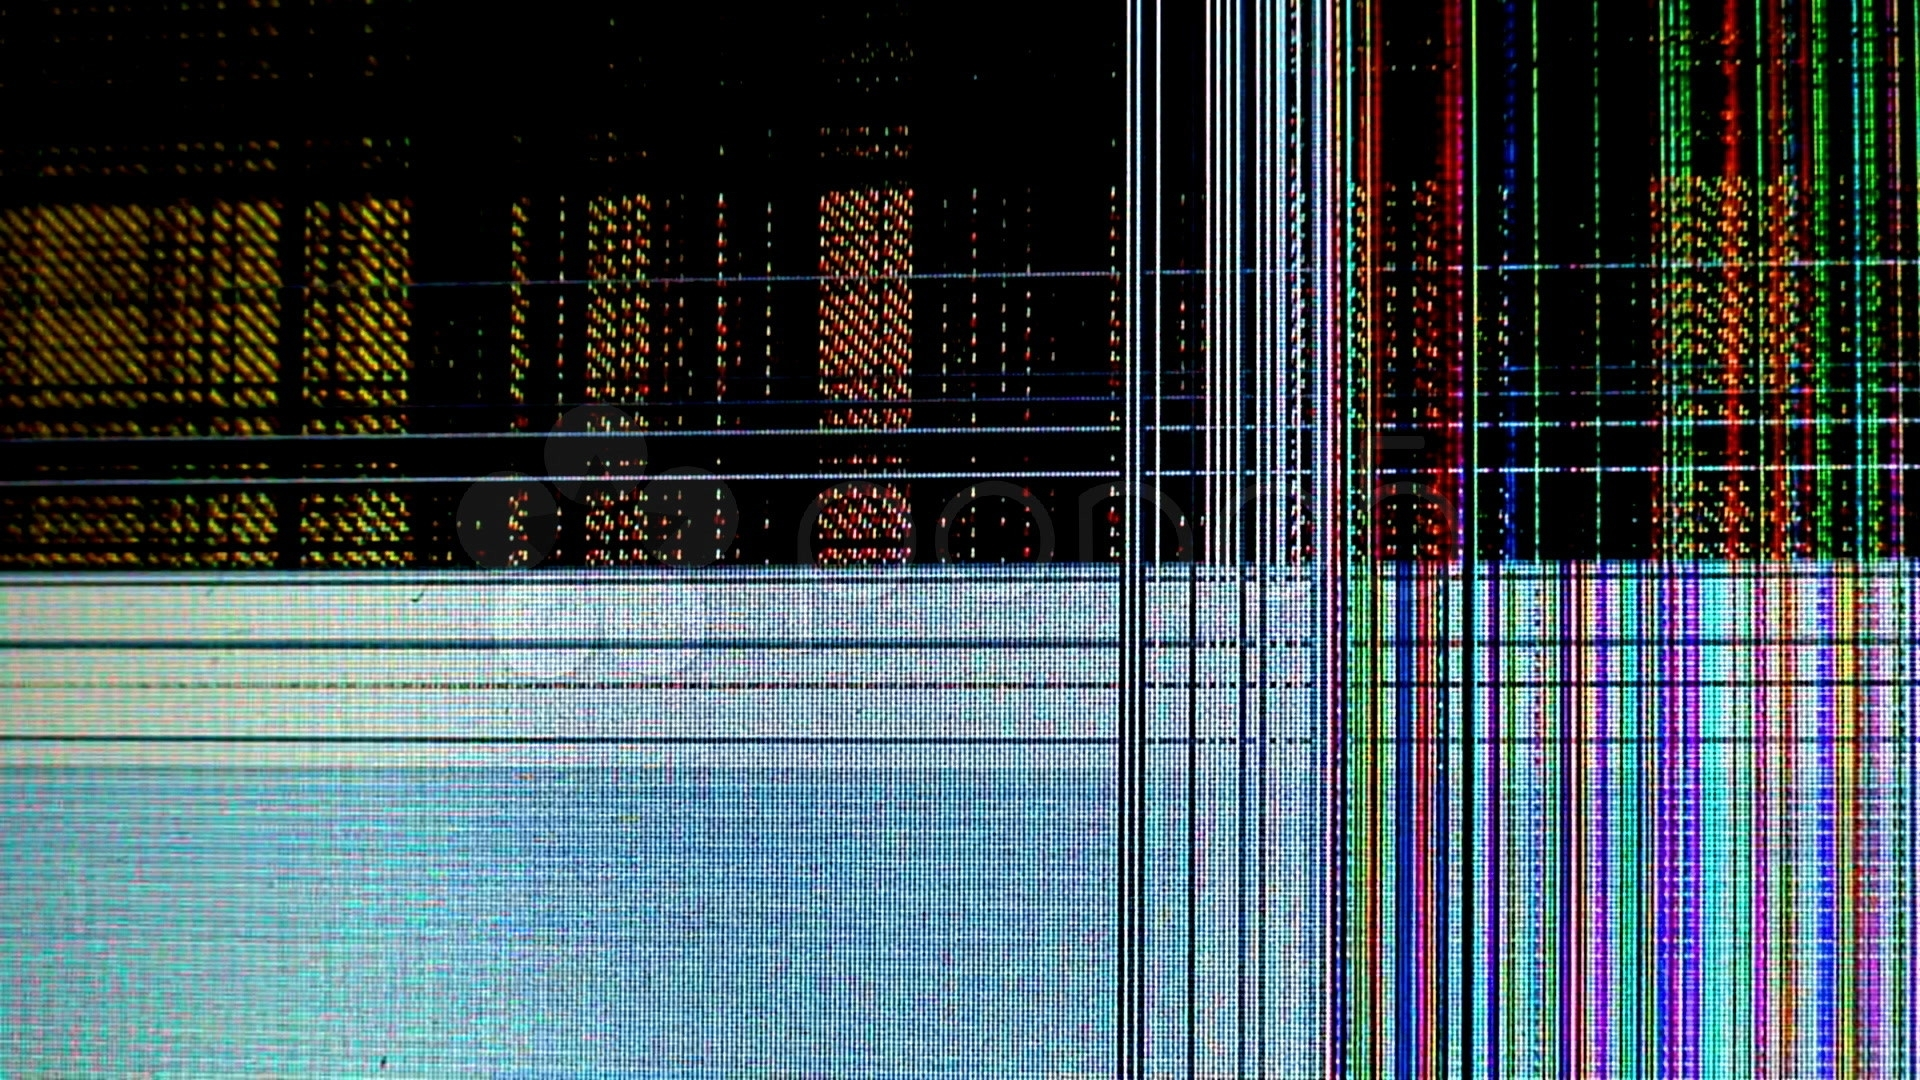 Broken Lcd Screen Wallpaper Dimension   Broken Lcd Screen 1920x1080